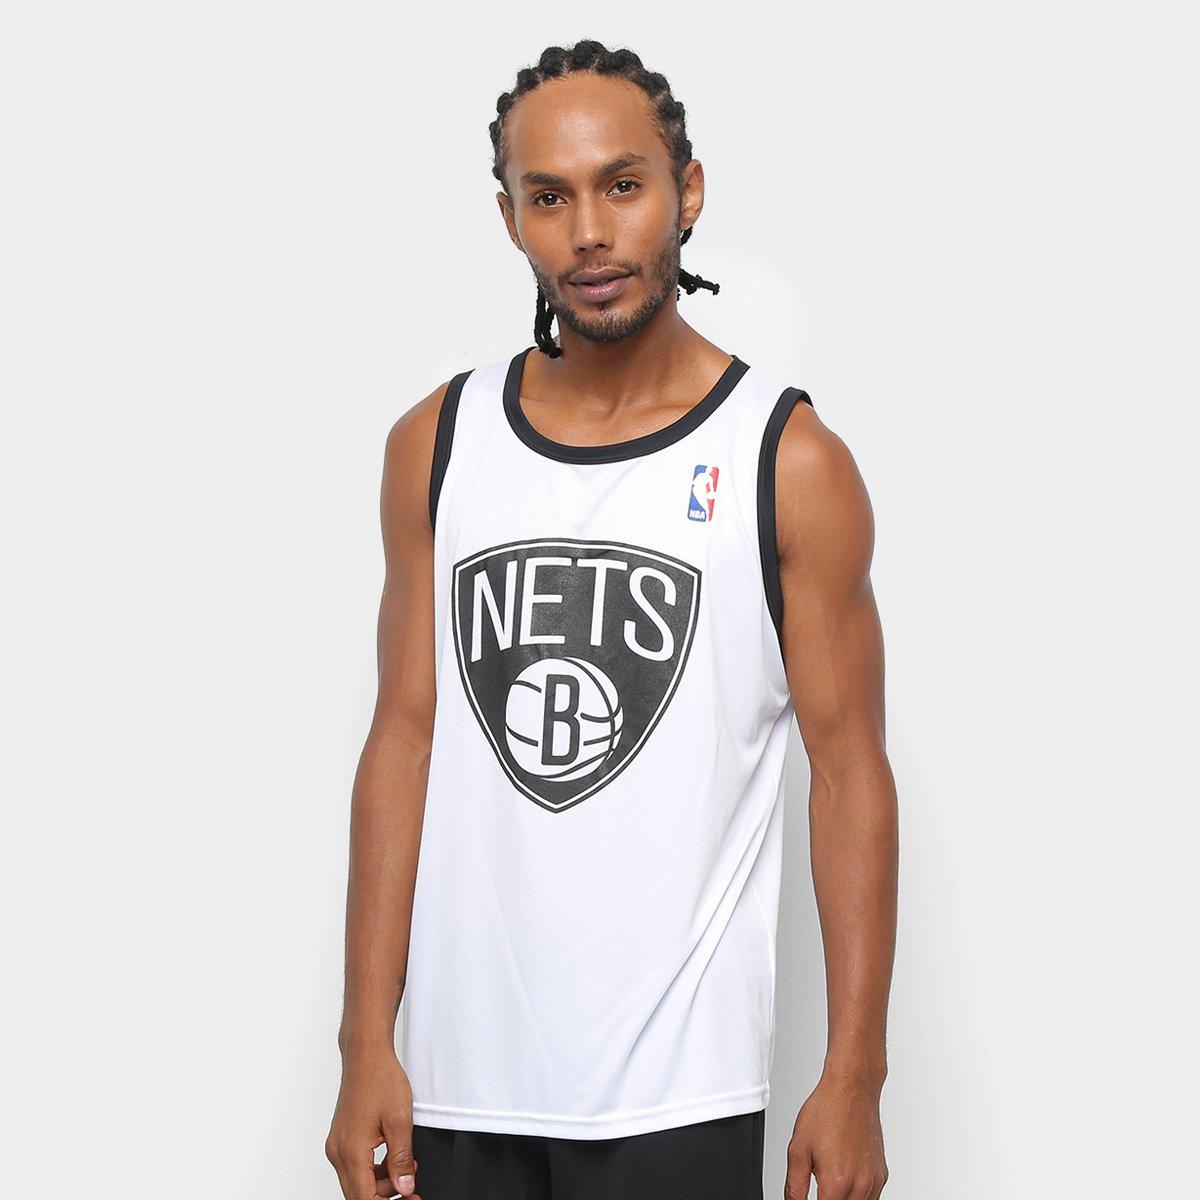 07f3c4021 Camiseta Regata NBA First Brooklyn Nets Masculina - Compre Agora ...